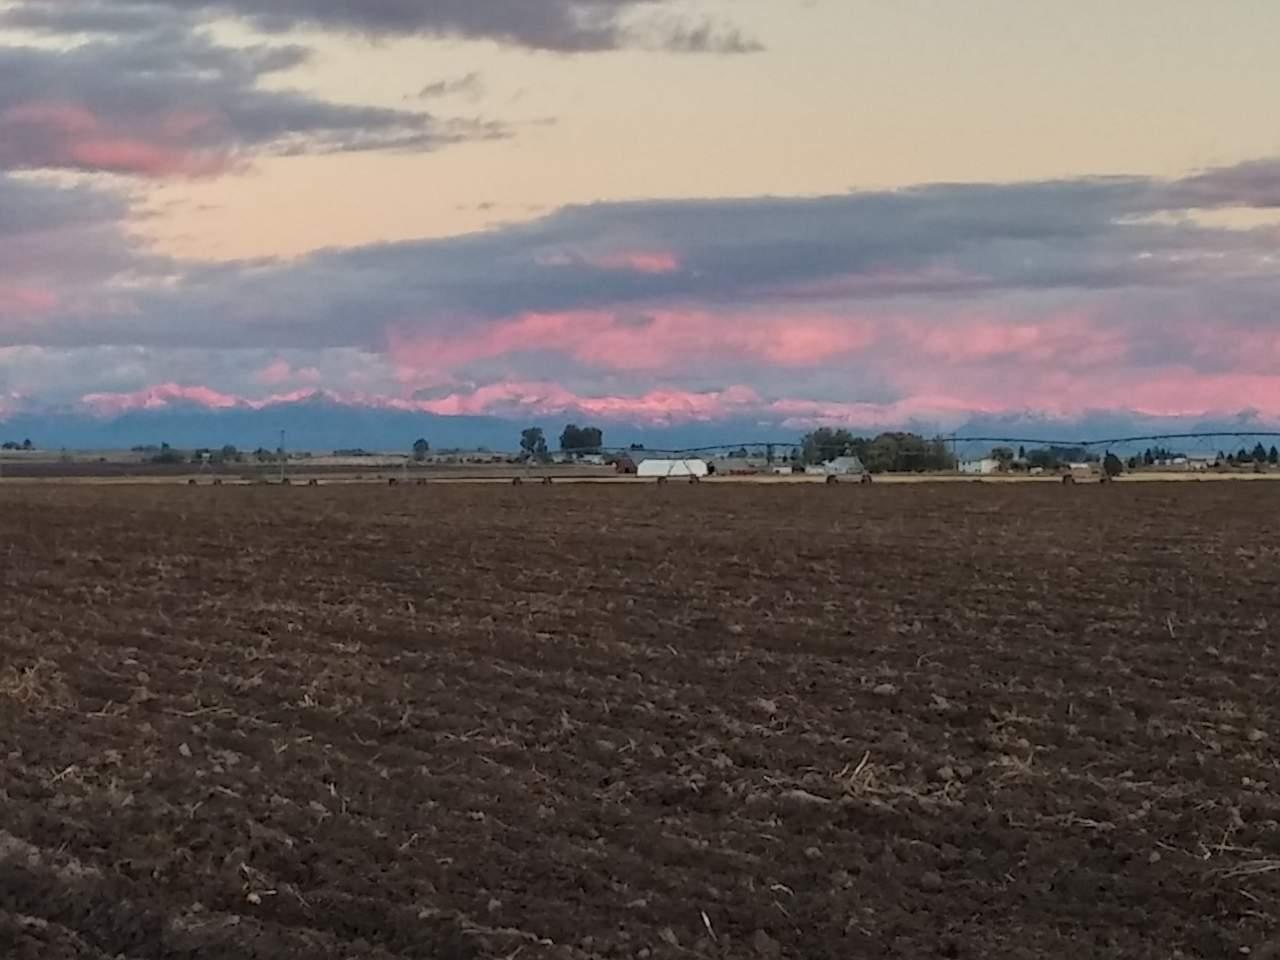 Photo of Teton Range at sunset.